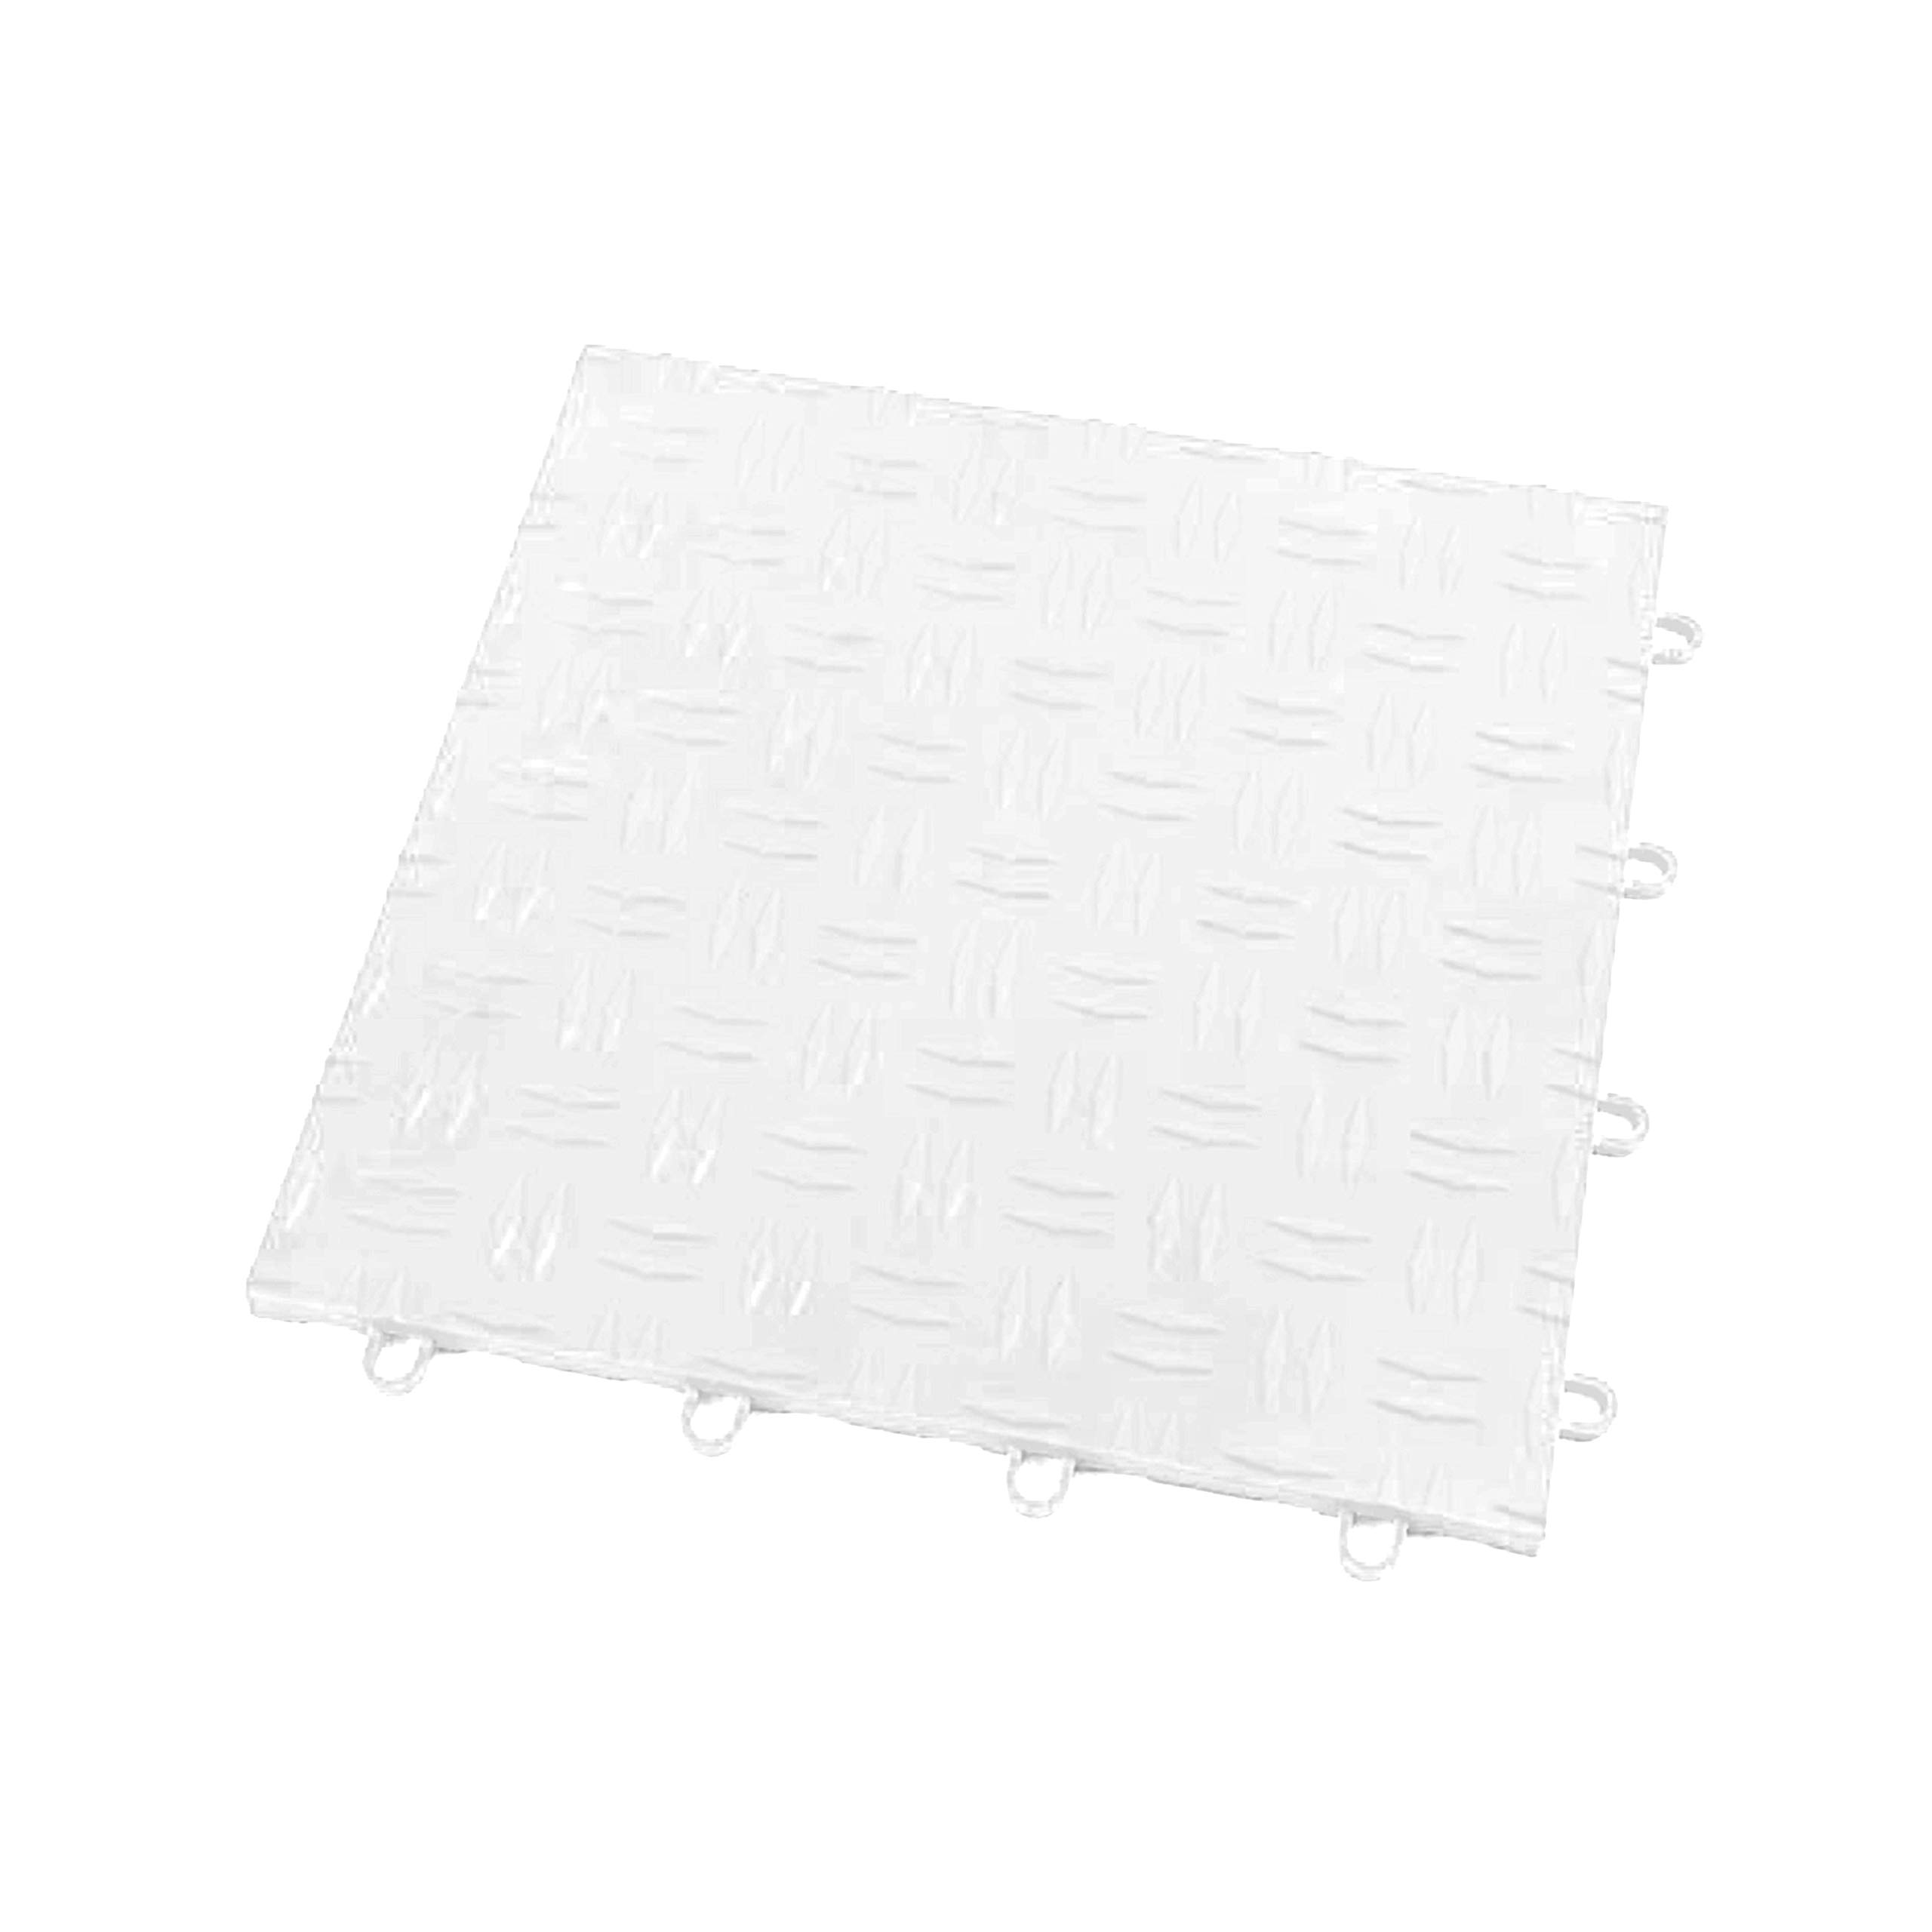 IncStores Diamond Grid-Loc Garage Flooring Snap Together Mat Drainage Tiles (48 Pack, Arctic White)